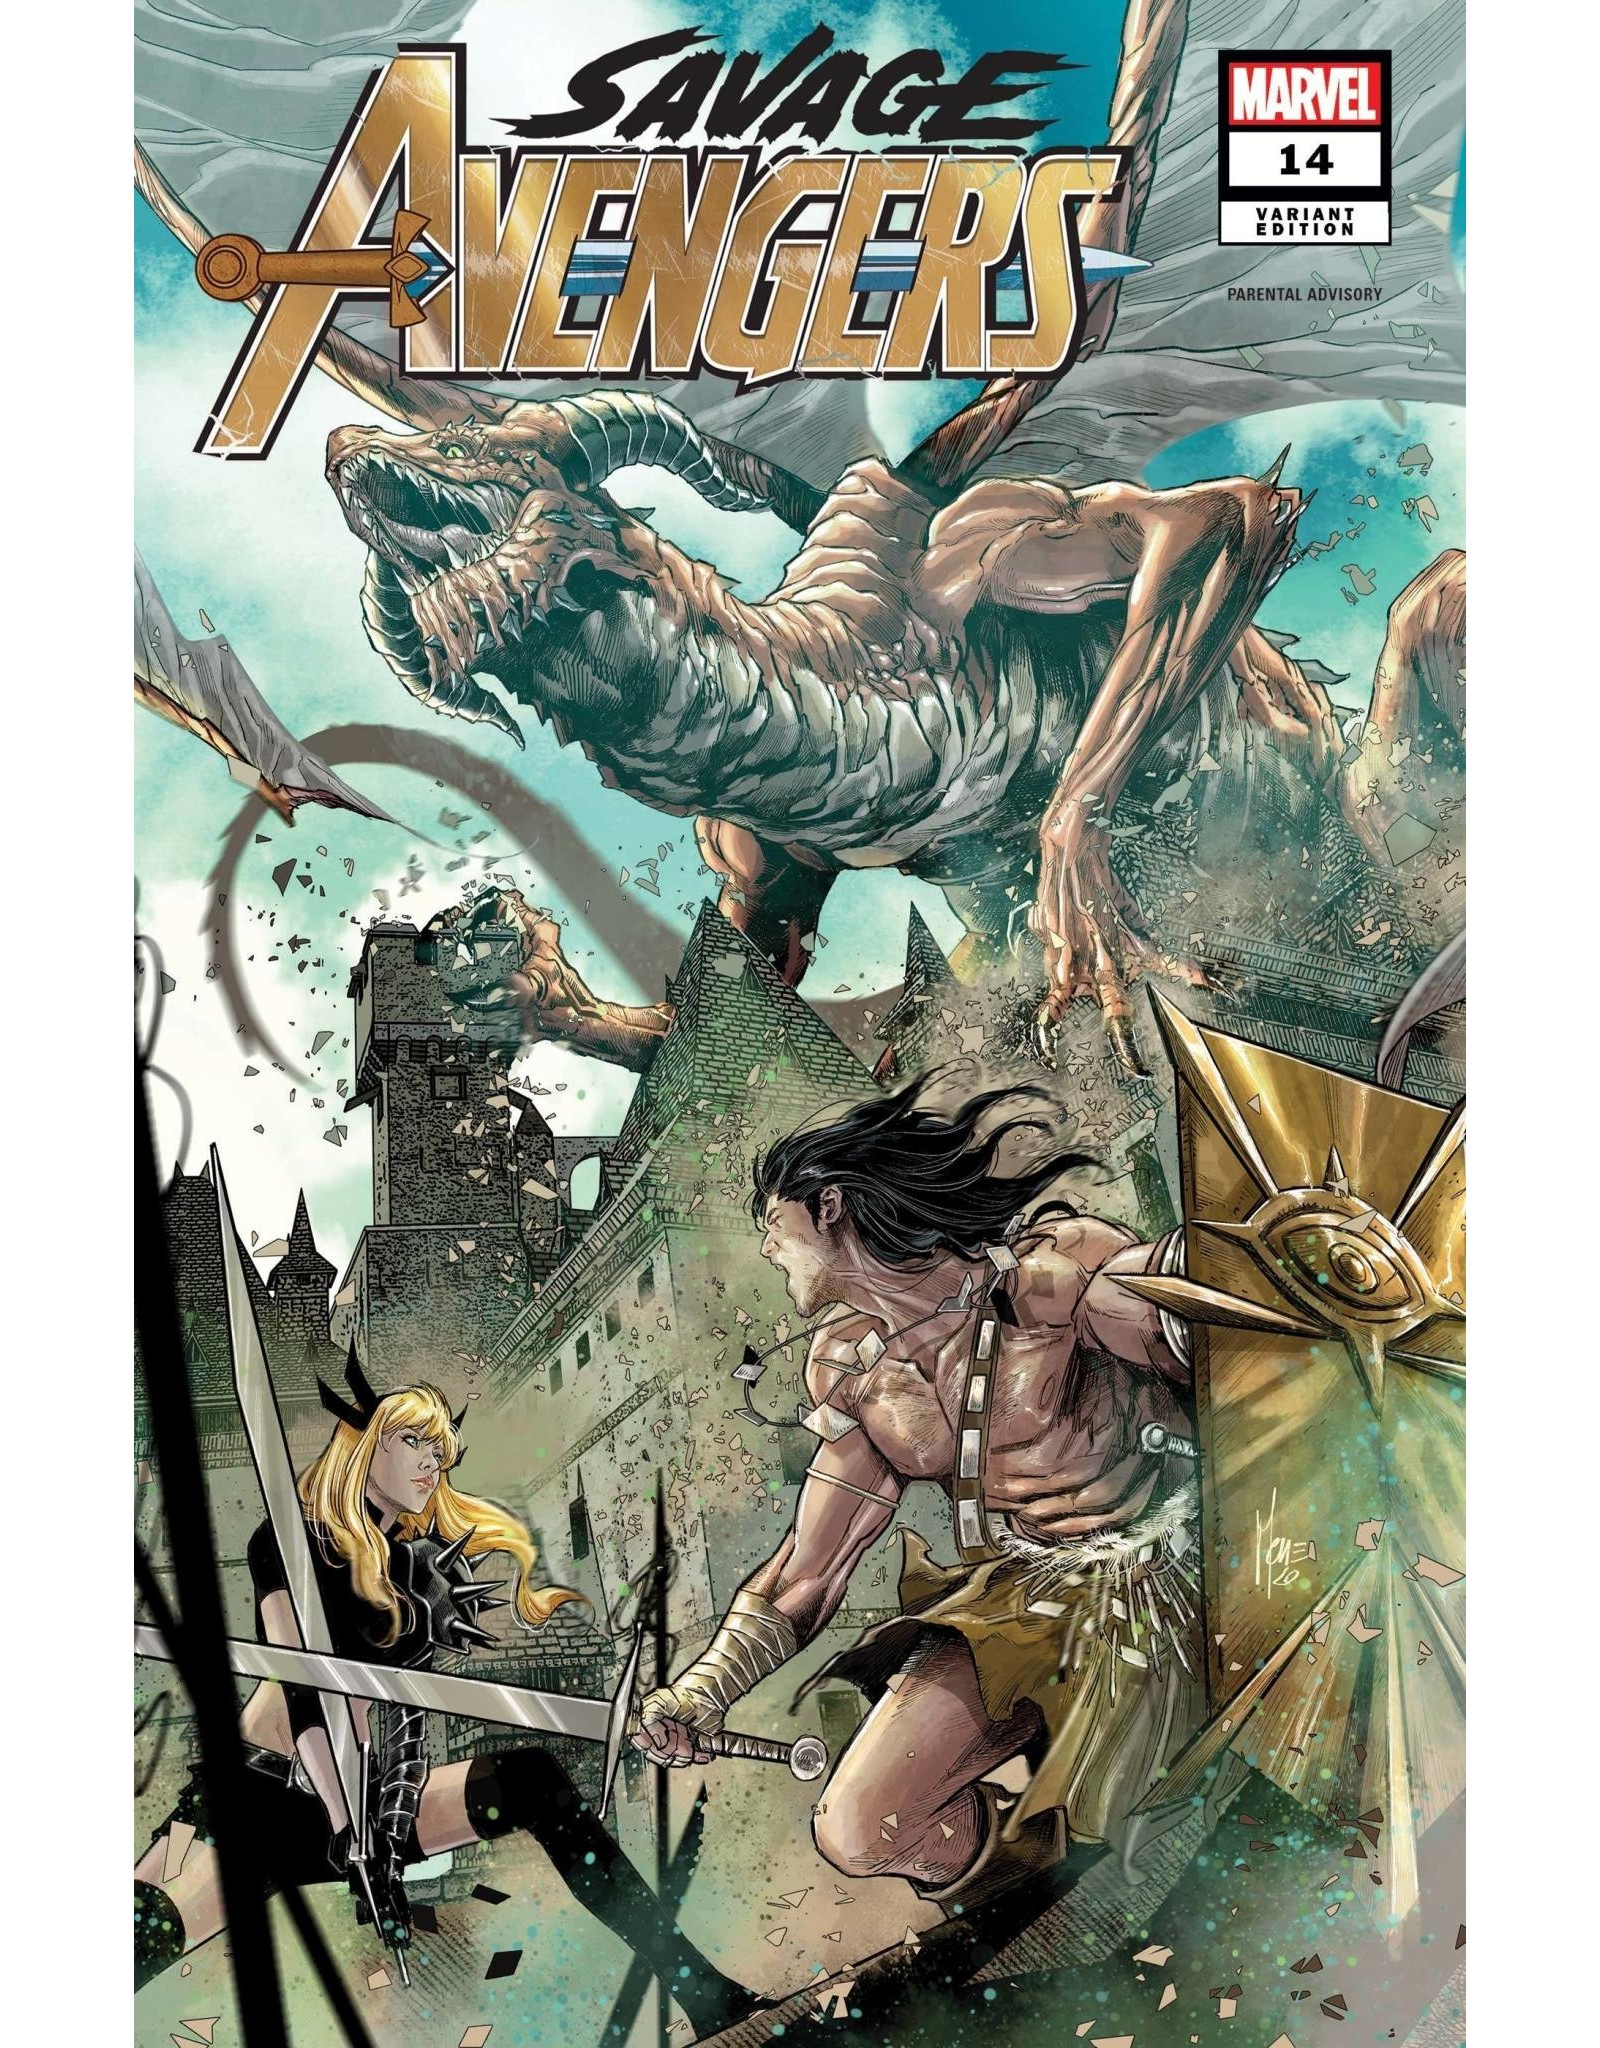 Marvel Comics SAVAGE AVENGERS #14 CHECCHETTO VAR